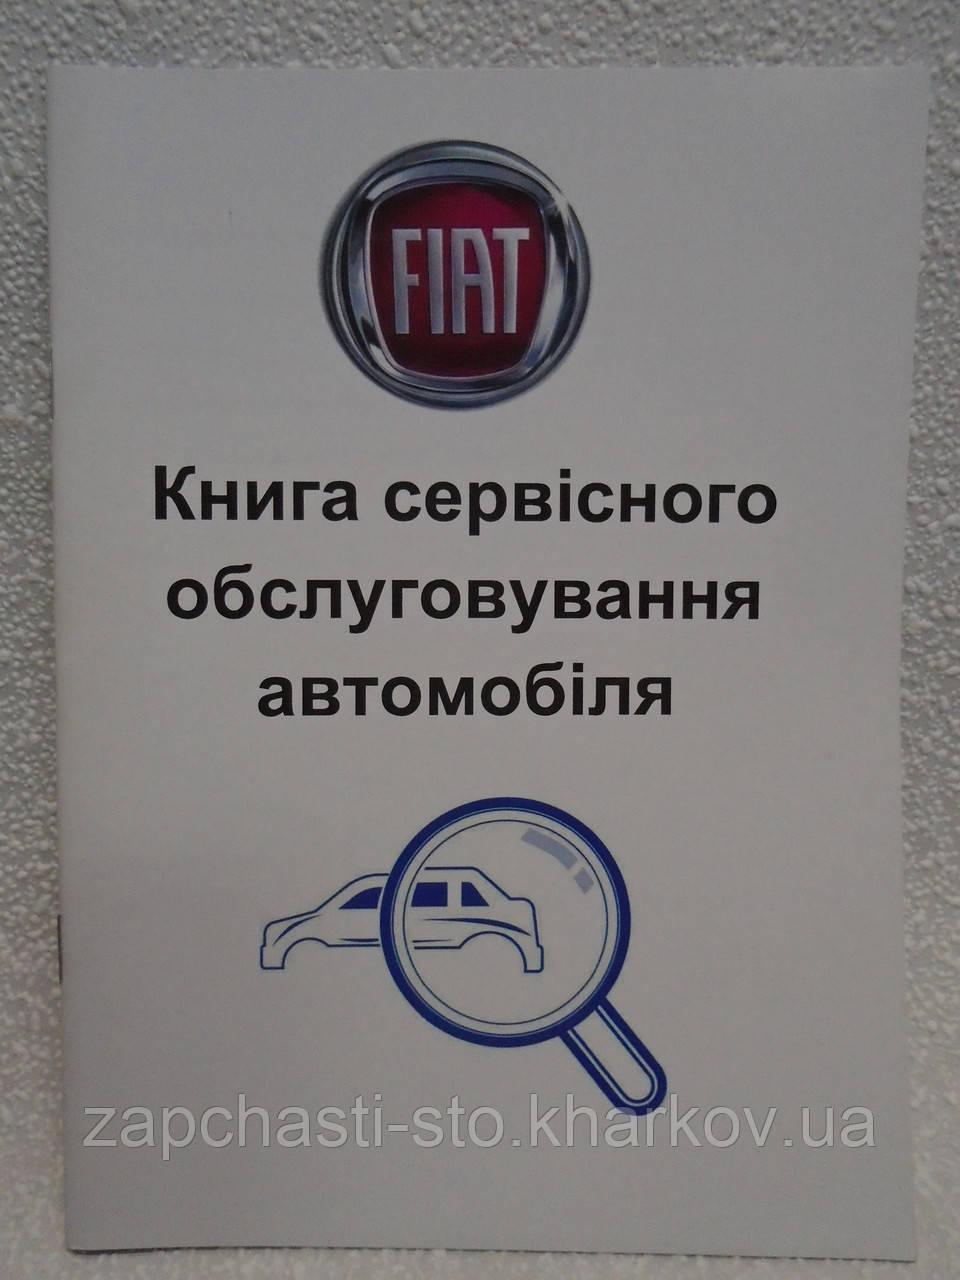 Сервисная книга автомобиля Fiat (Фиат)